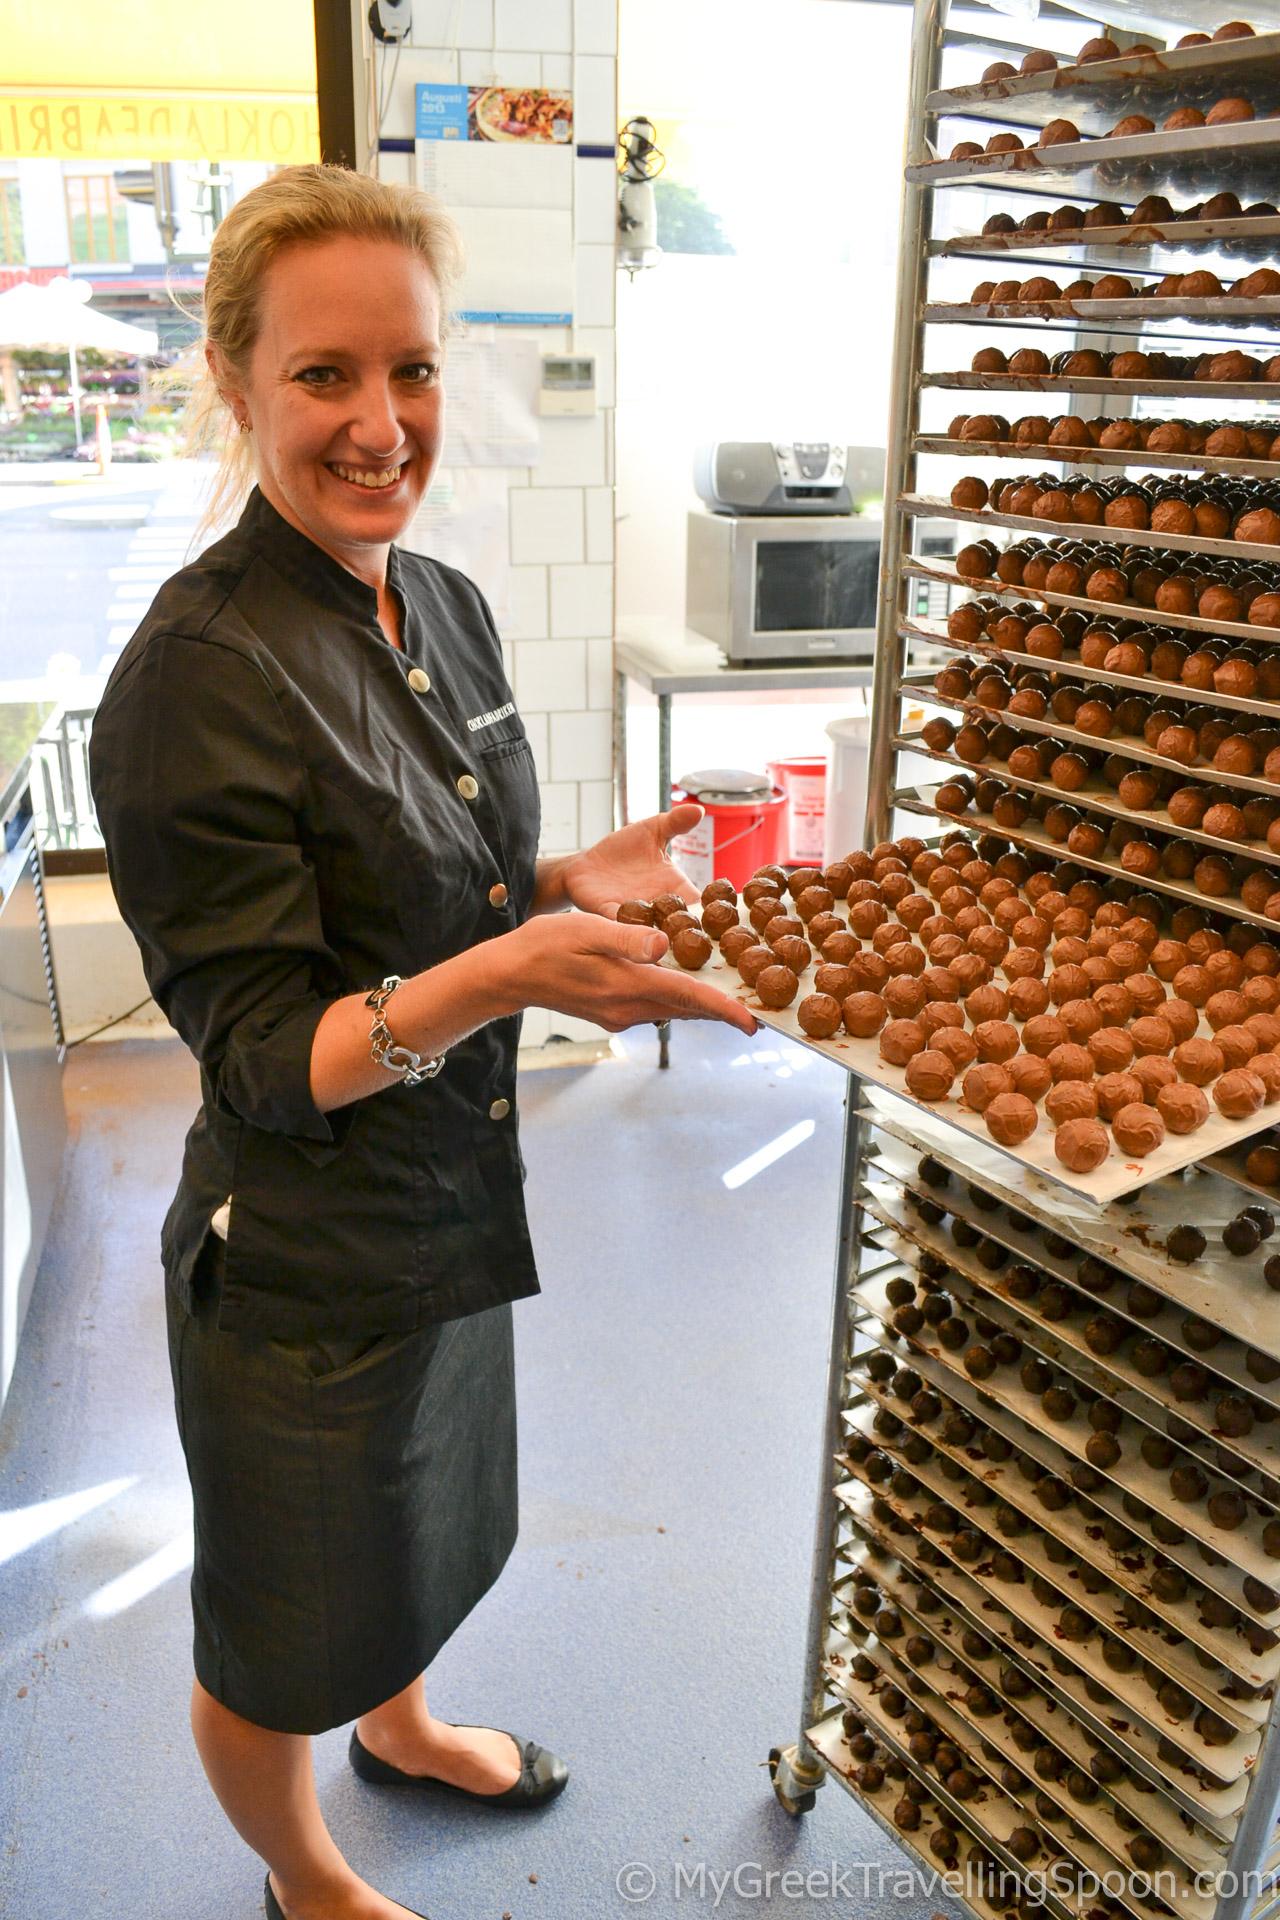 Chokladfabriken is a chocolate heaven.